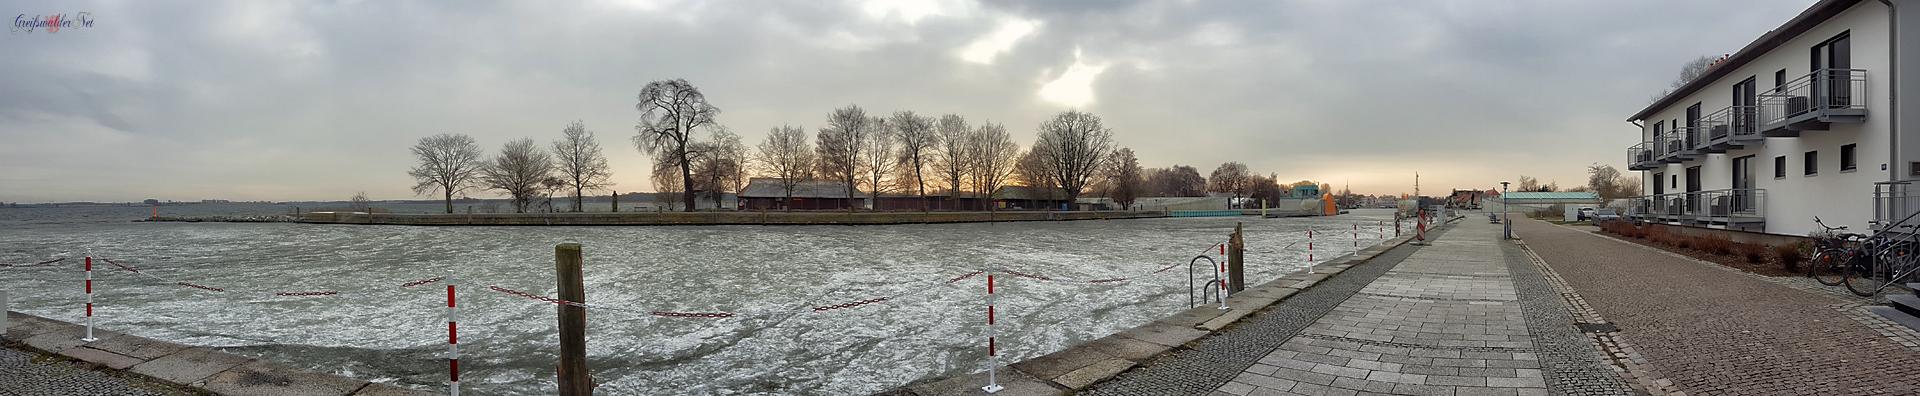 9. Januar 2018 - Greifswald-Wieck eiskalt